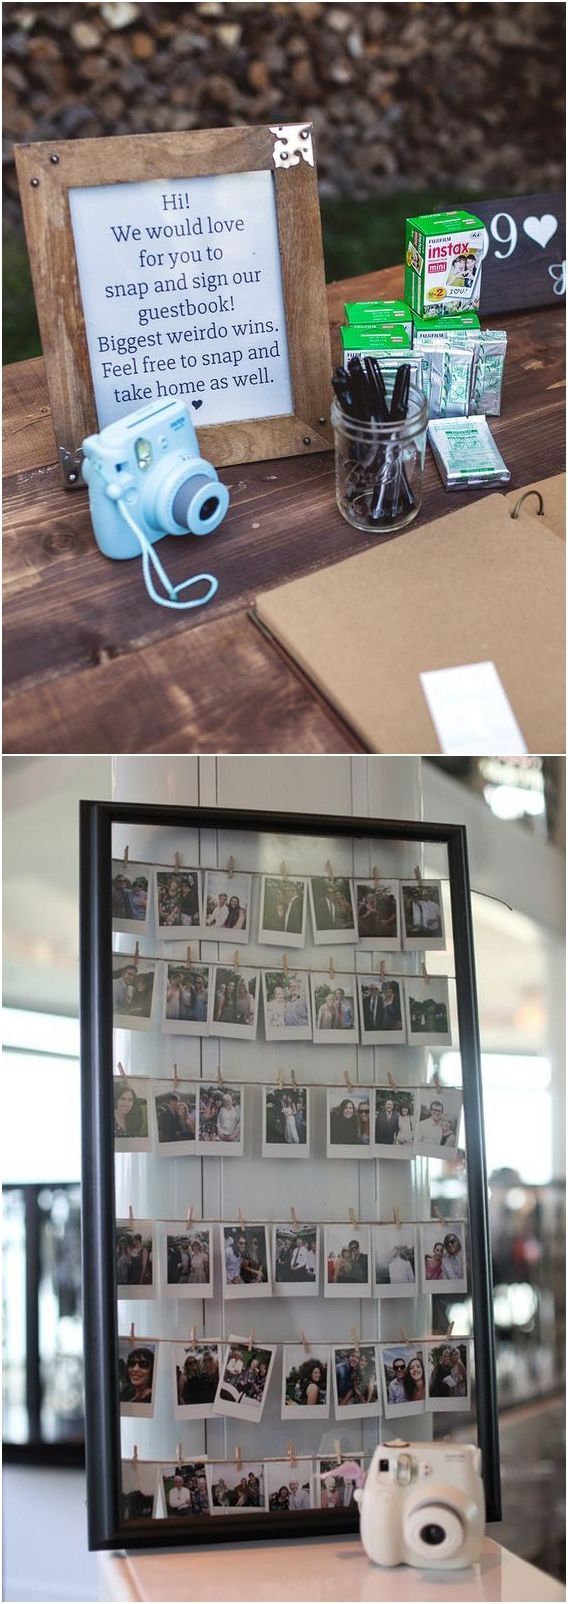 Polaroid Wedding Guest Books | Polaroid wedding, Wedding guest book,  Polaroid guest book wedding